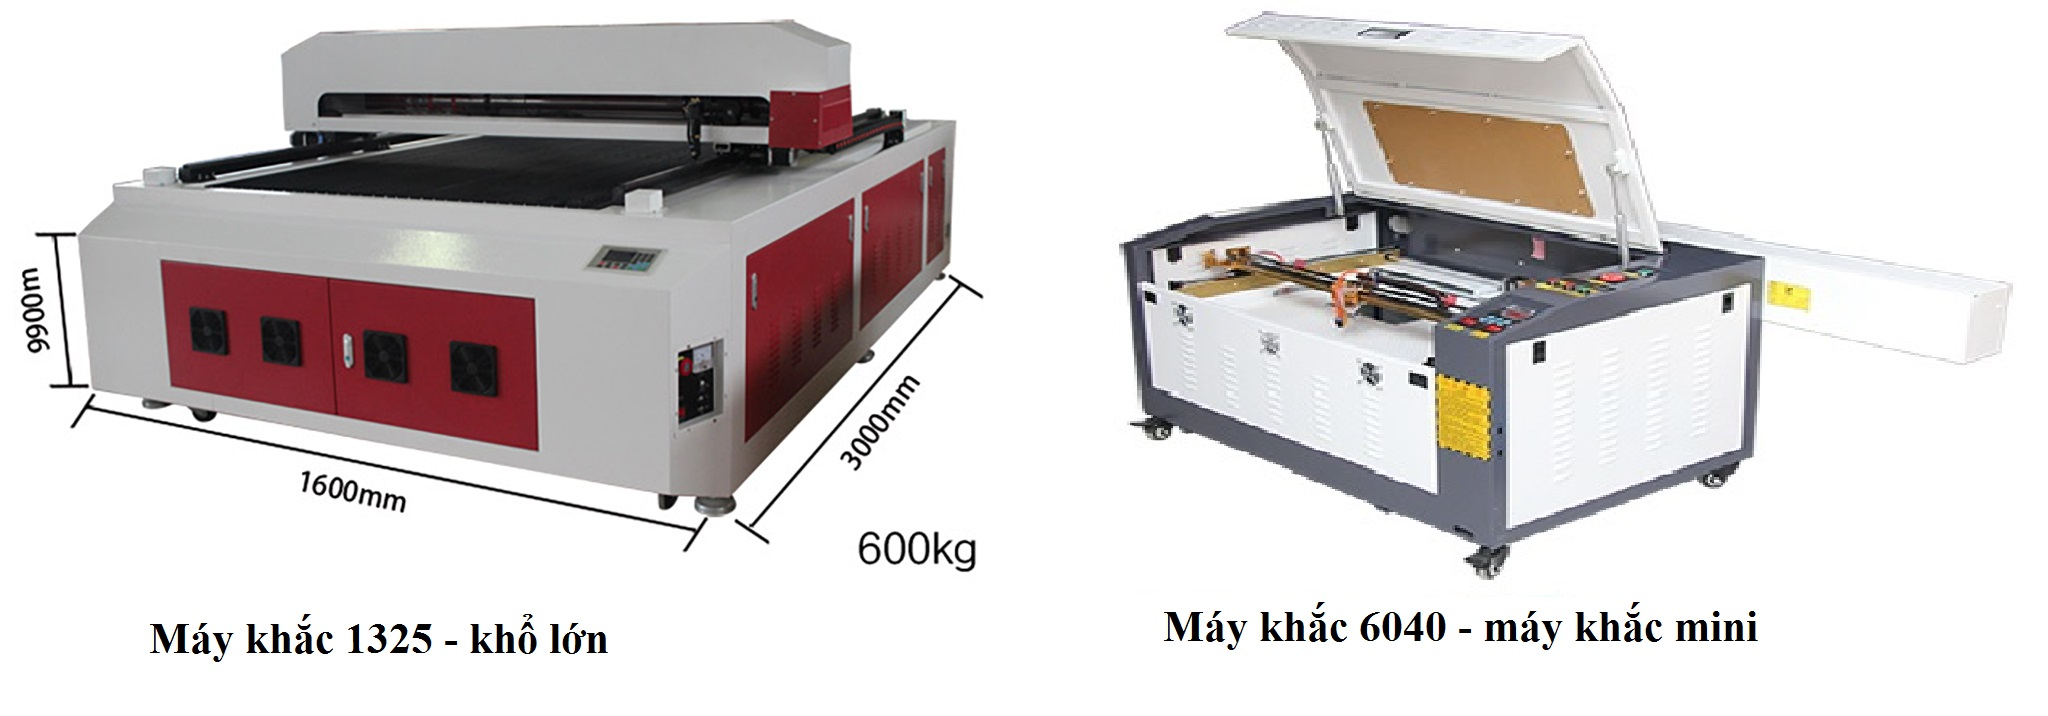 Mua máy khắc laser mini hay máy khắc laser khổ lớn?